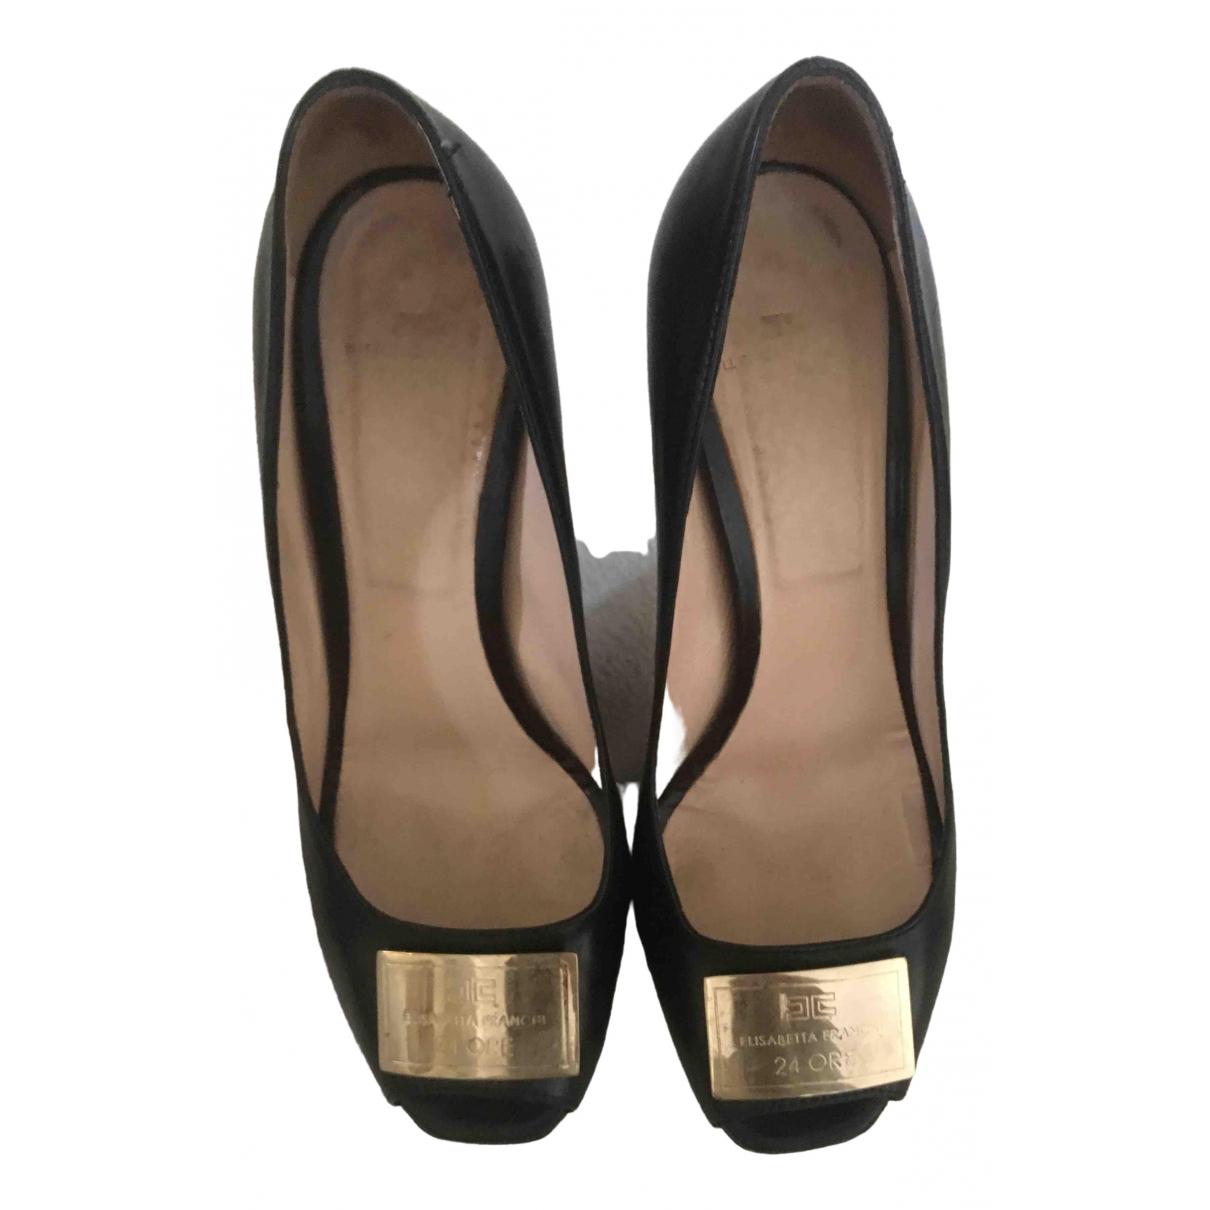 Elisabetta Franchi \N Black Leather Heels for Women 39 EU